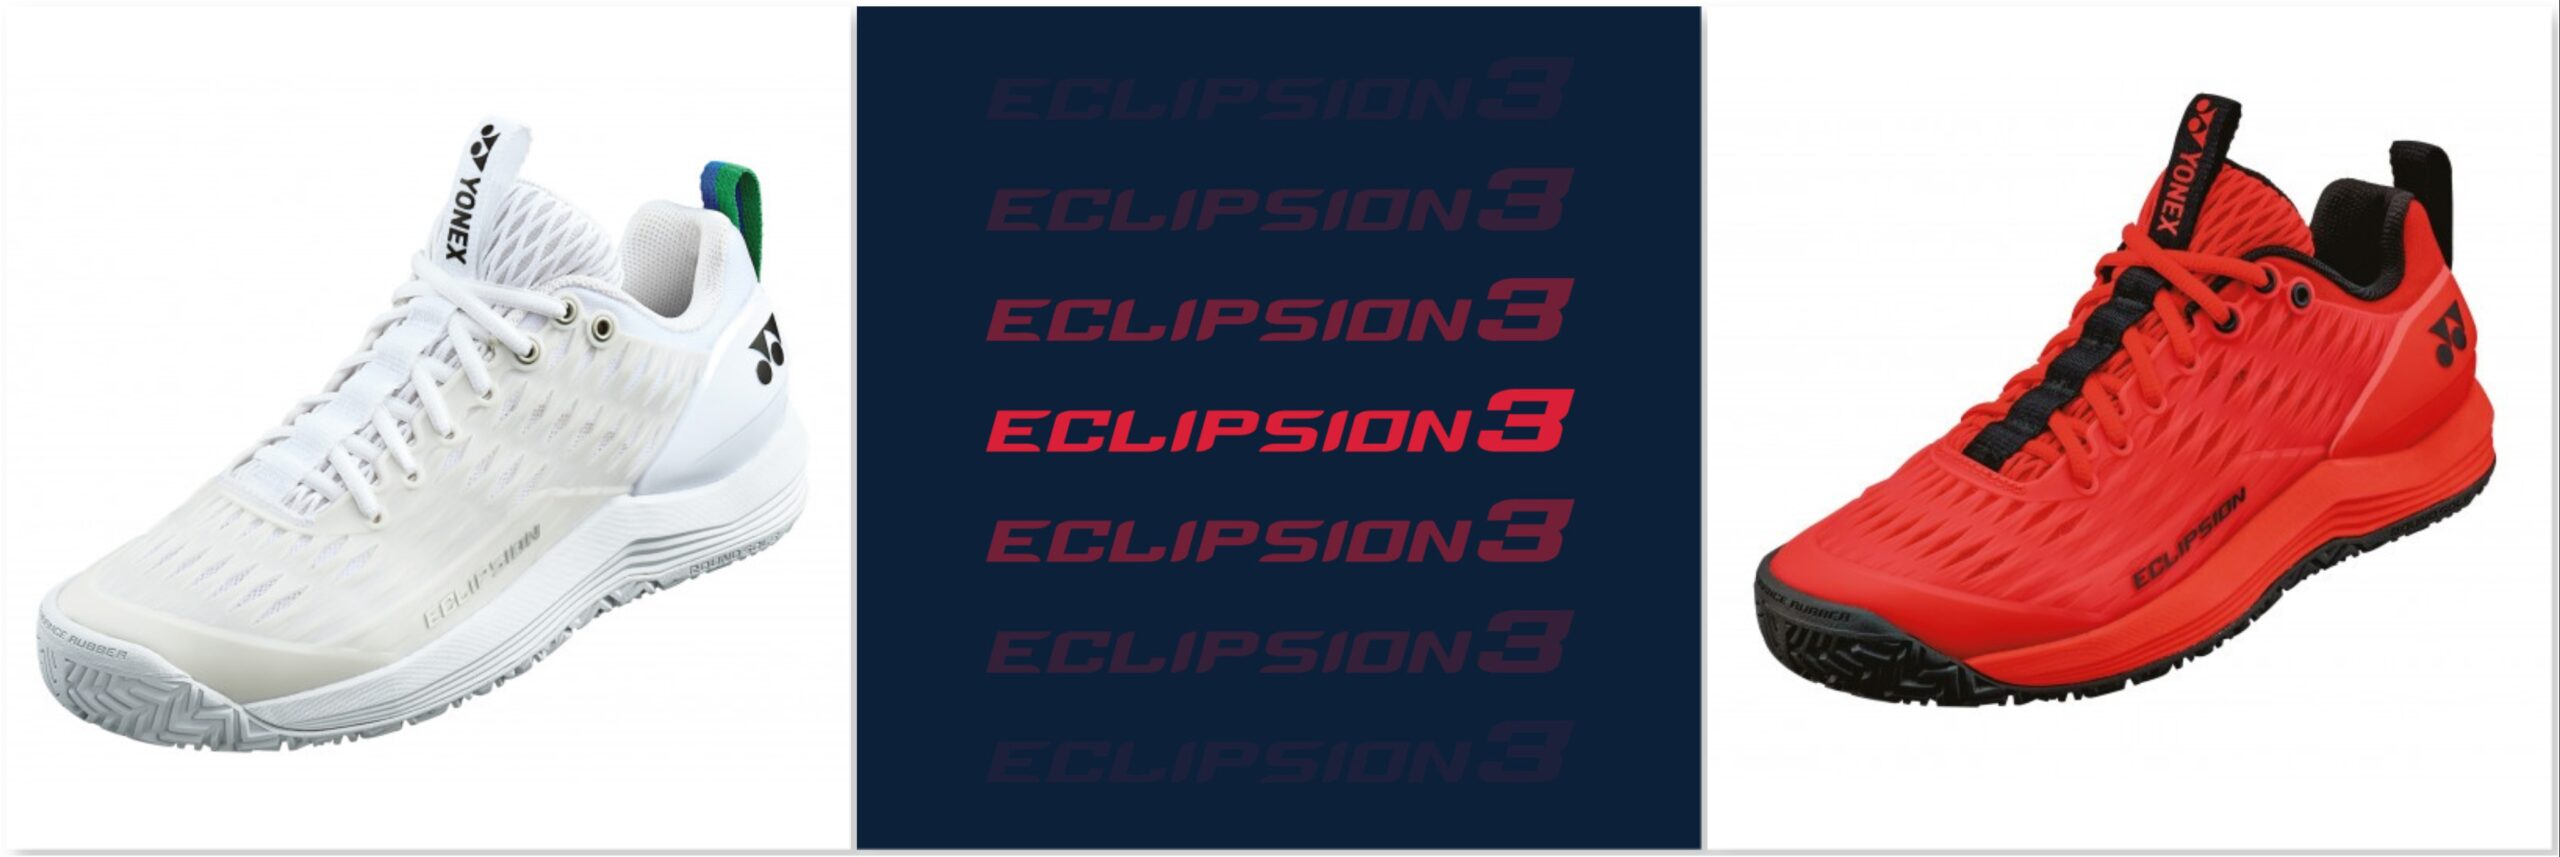 chaussure eclipsion 3 yonex